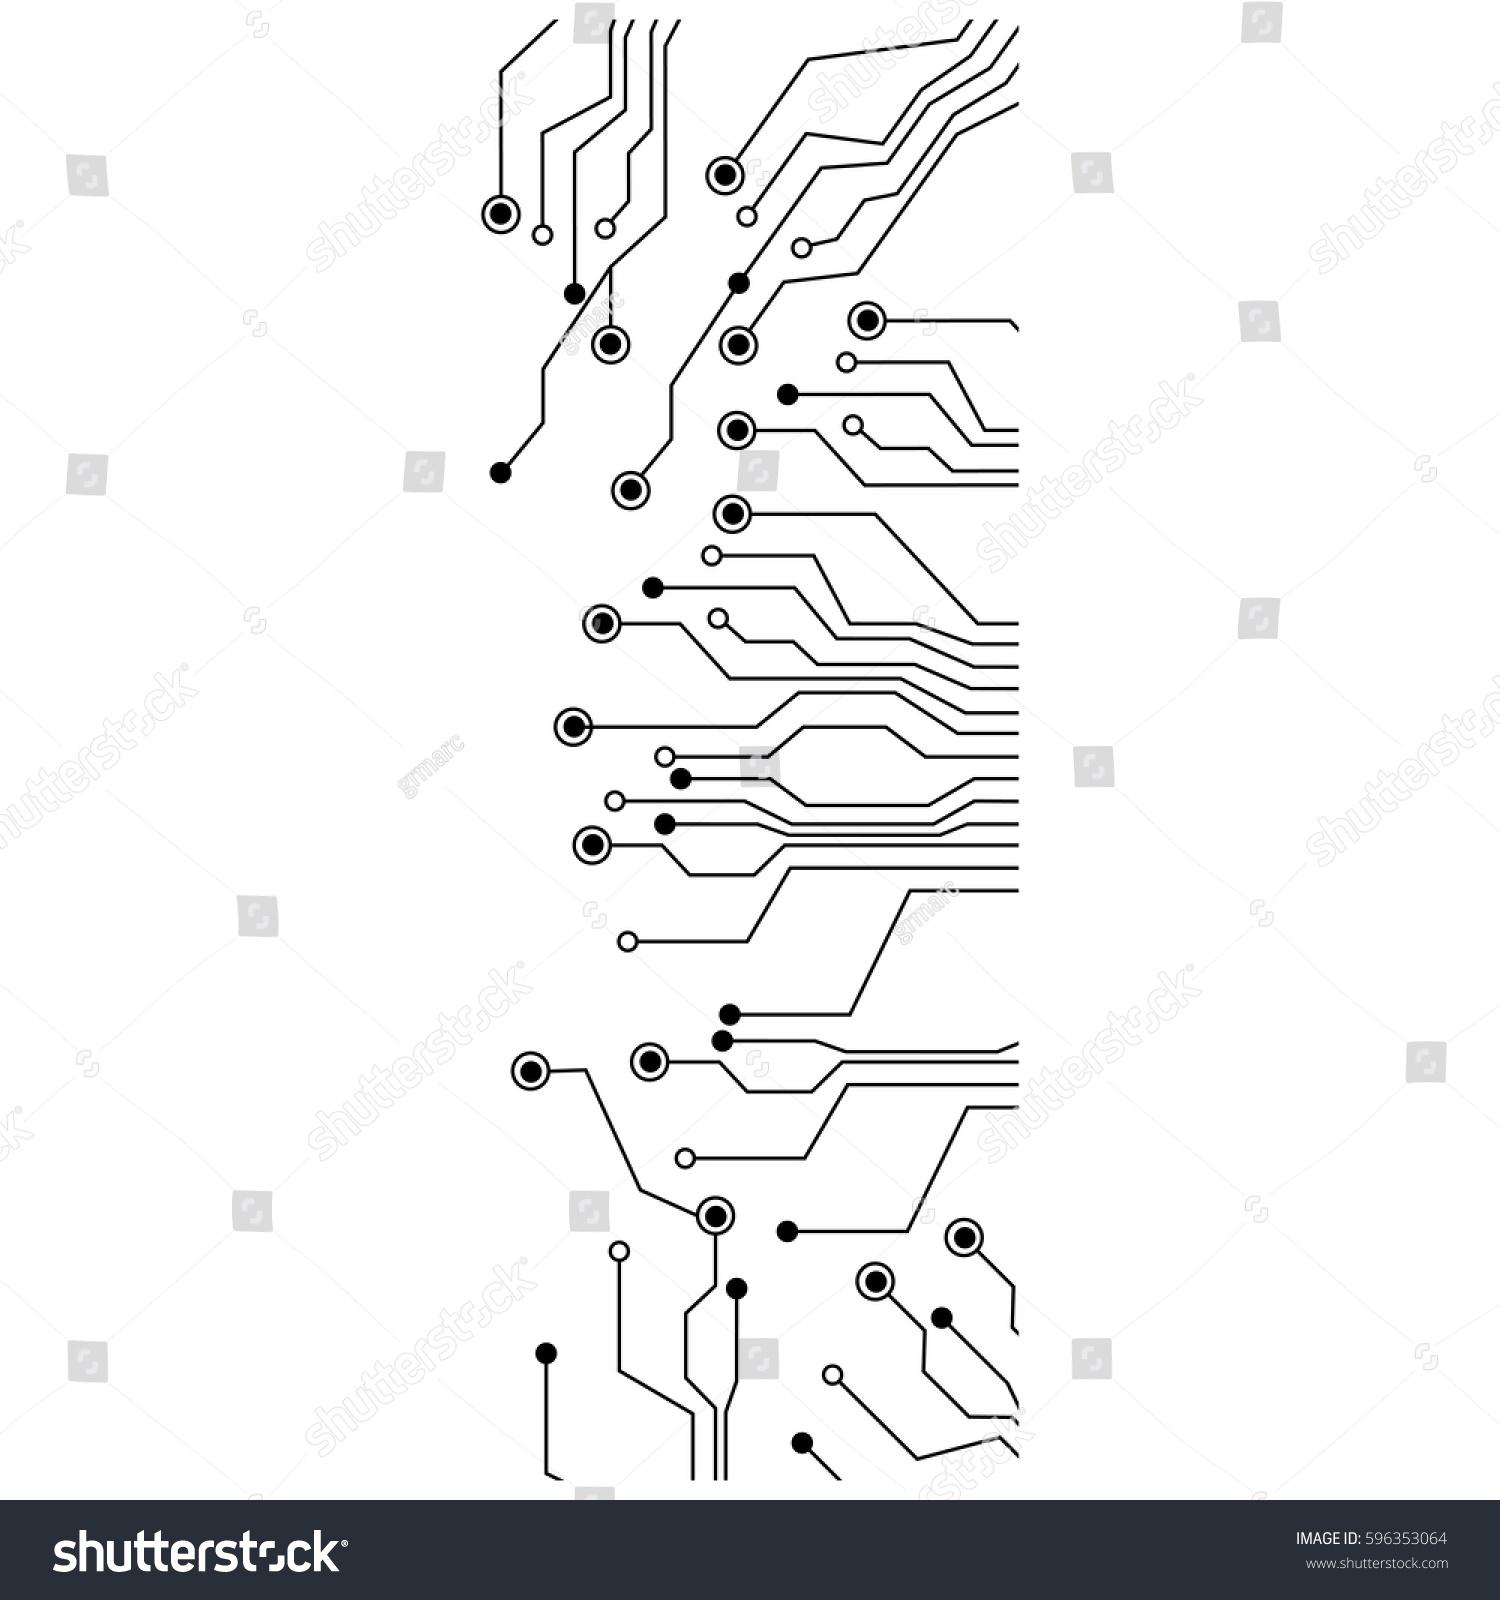 Figure Electrical Circuits Icon Vector Illustraction Stock Design Circuit